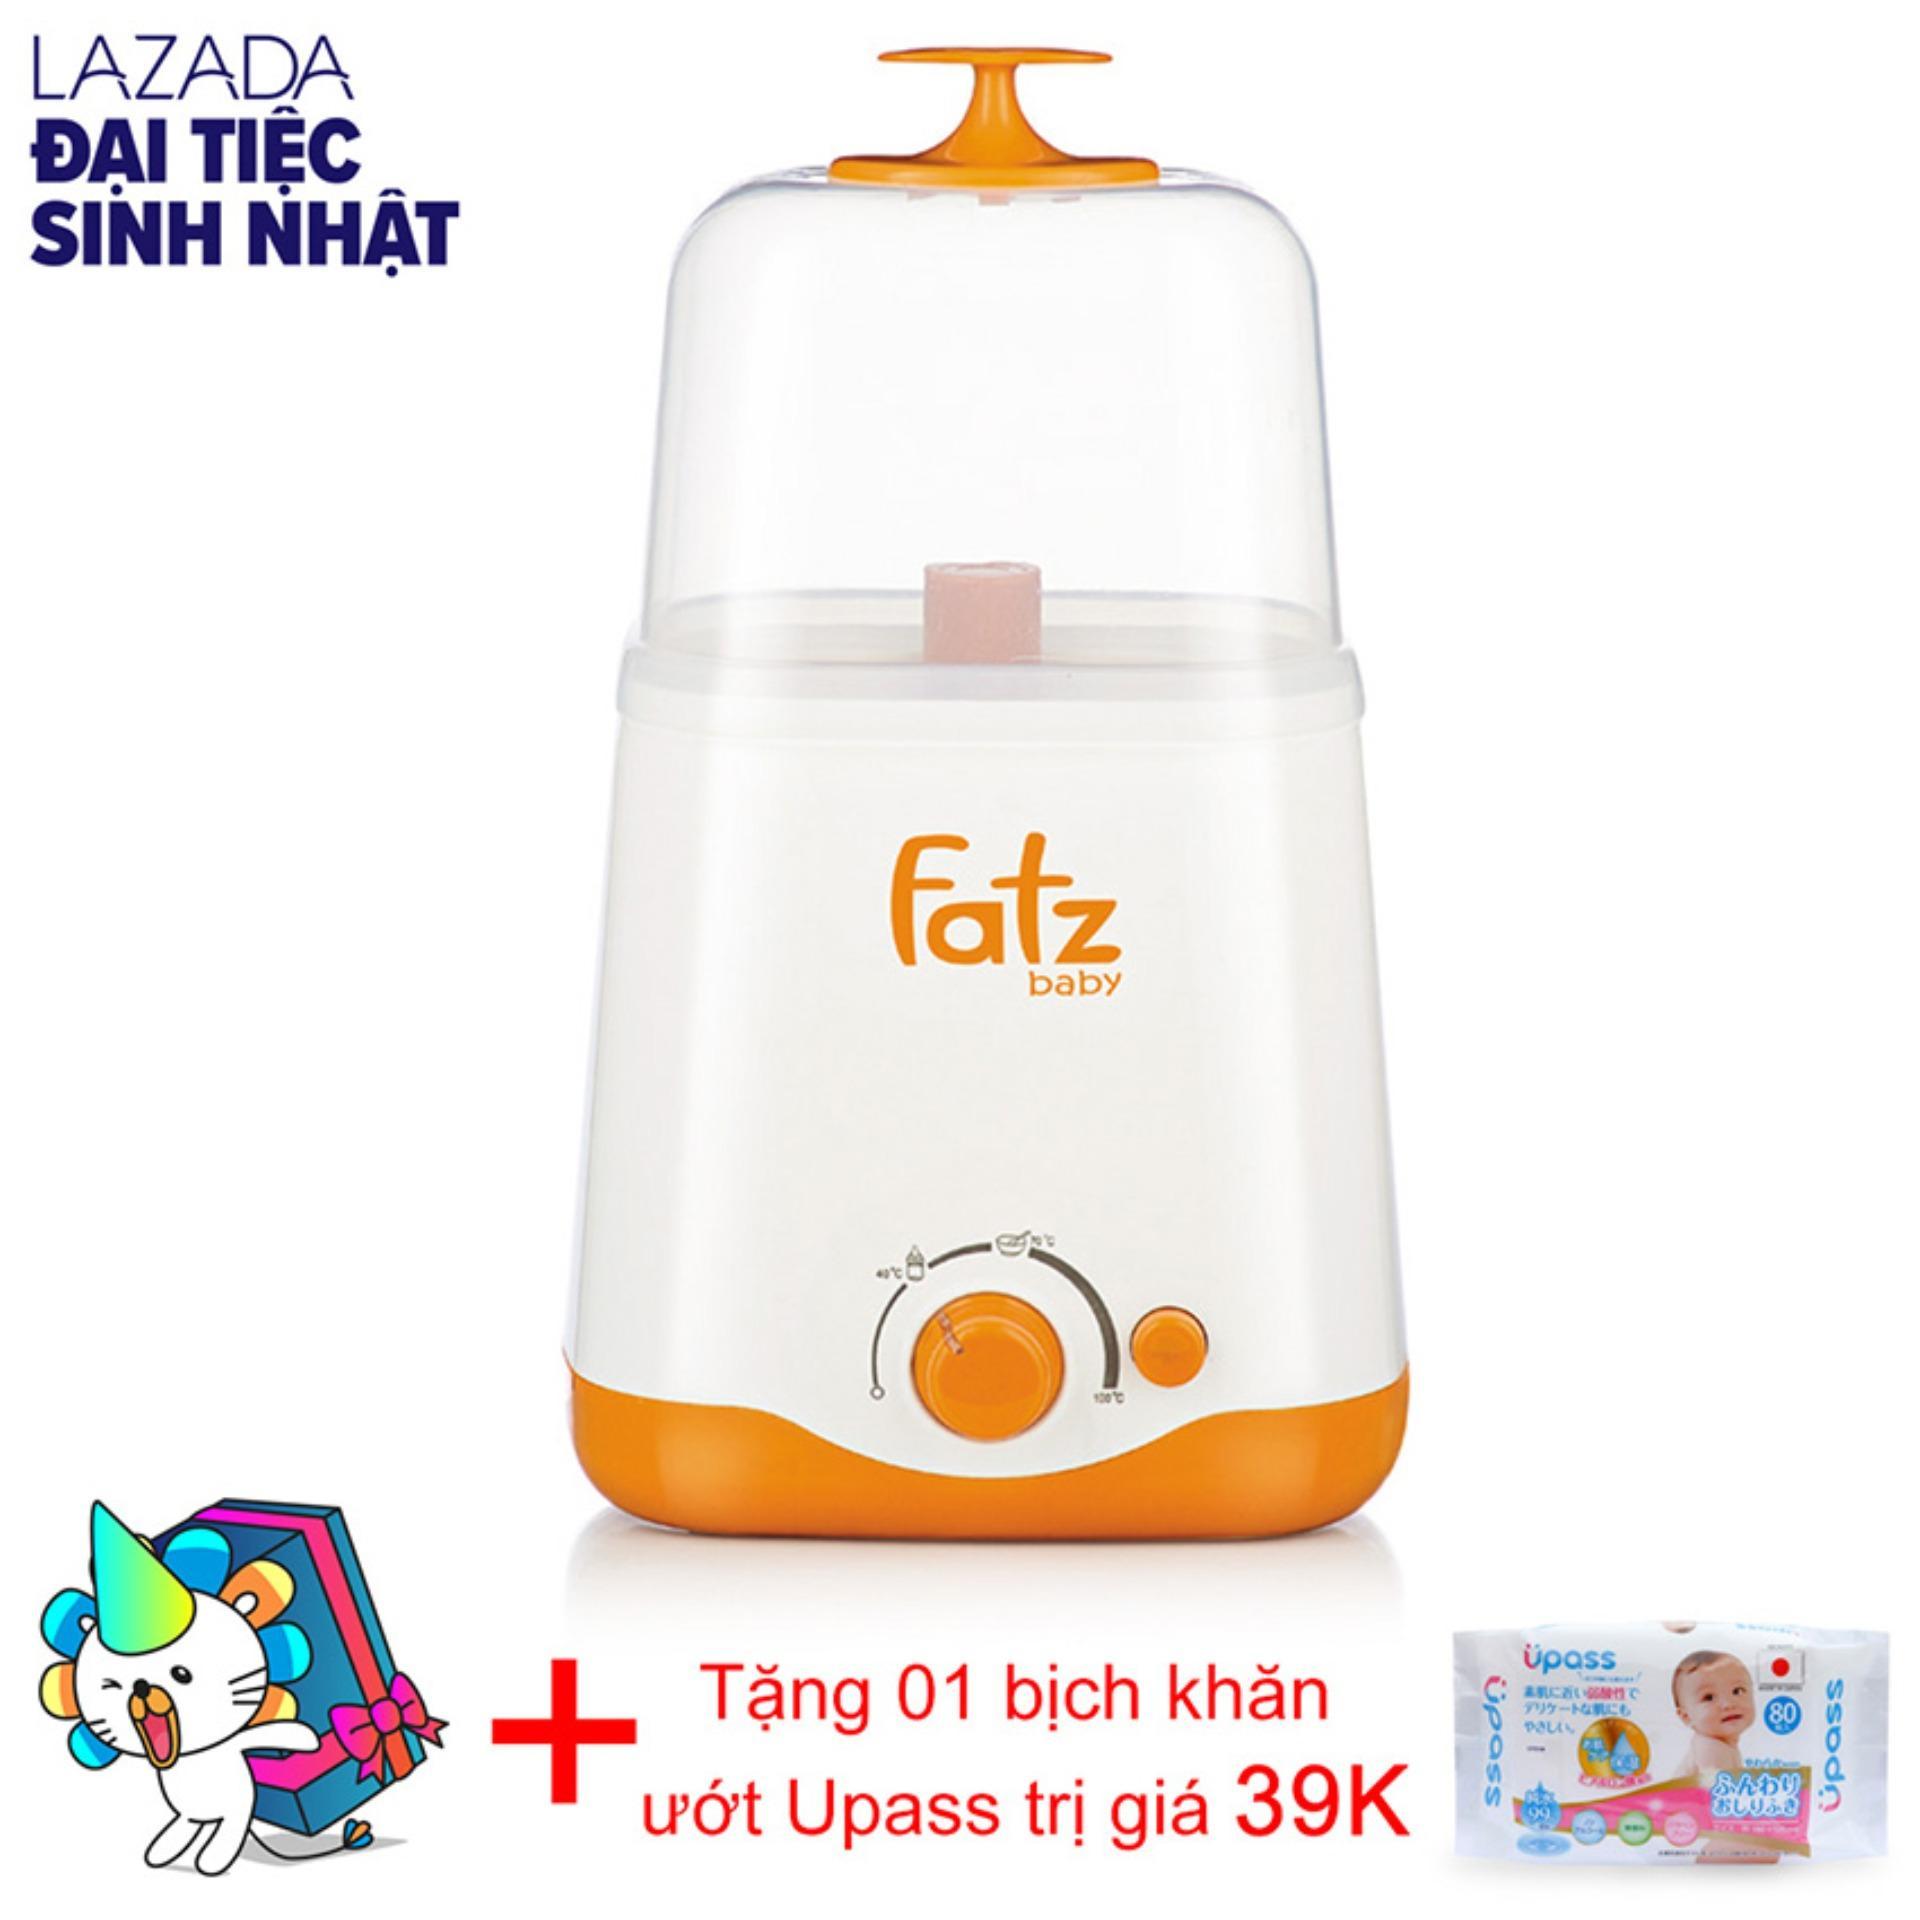 Giá Bán May Ham Sữa Hai Binh Cổ Rộng Thế Hệ Mới Fatz Baby Fb3012Sl Fatz Baby Mới